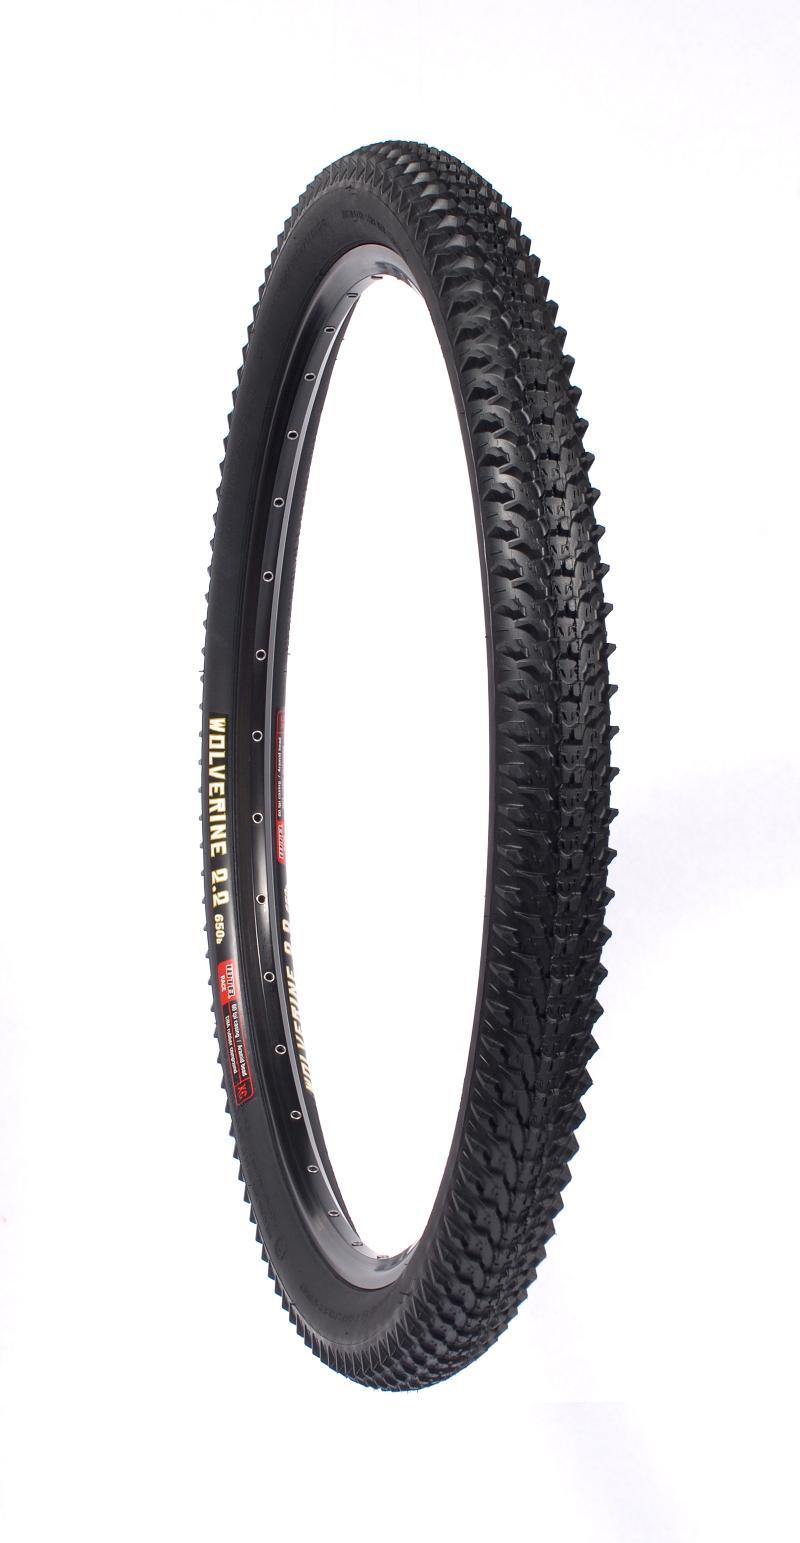 WTB 650b Wolverine Tire